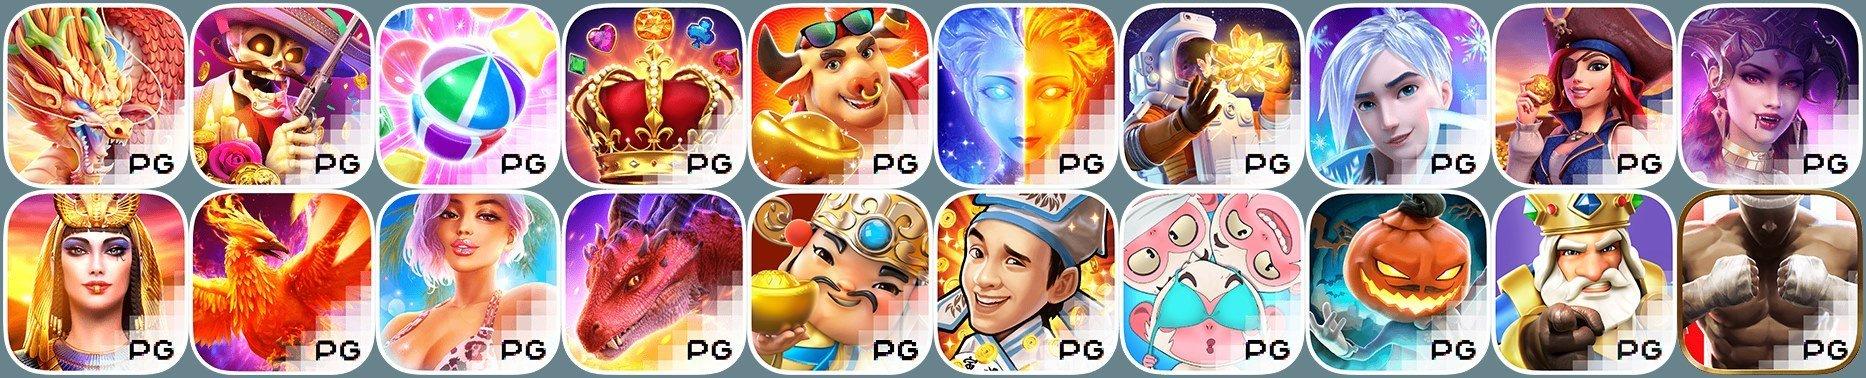 gameslot pgslot